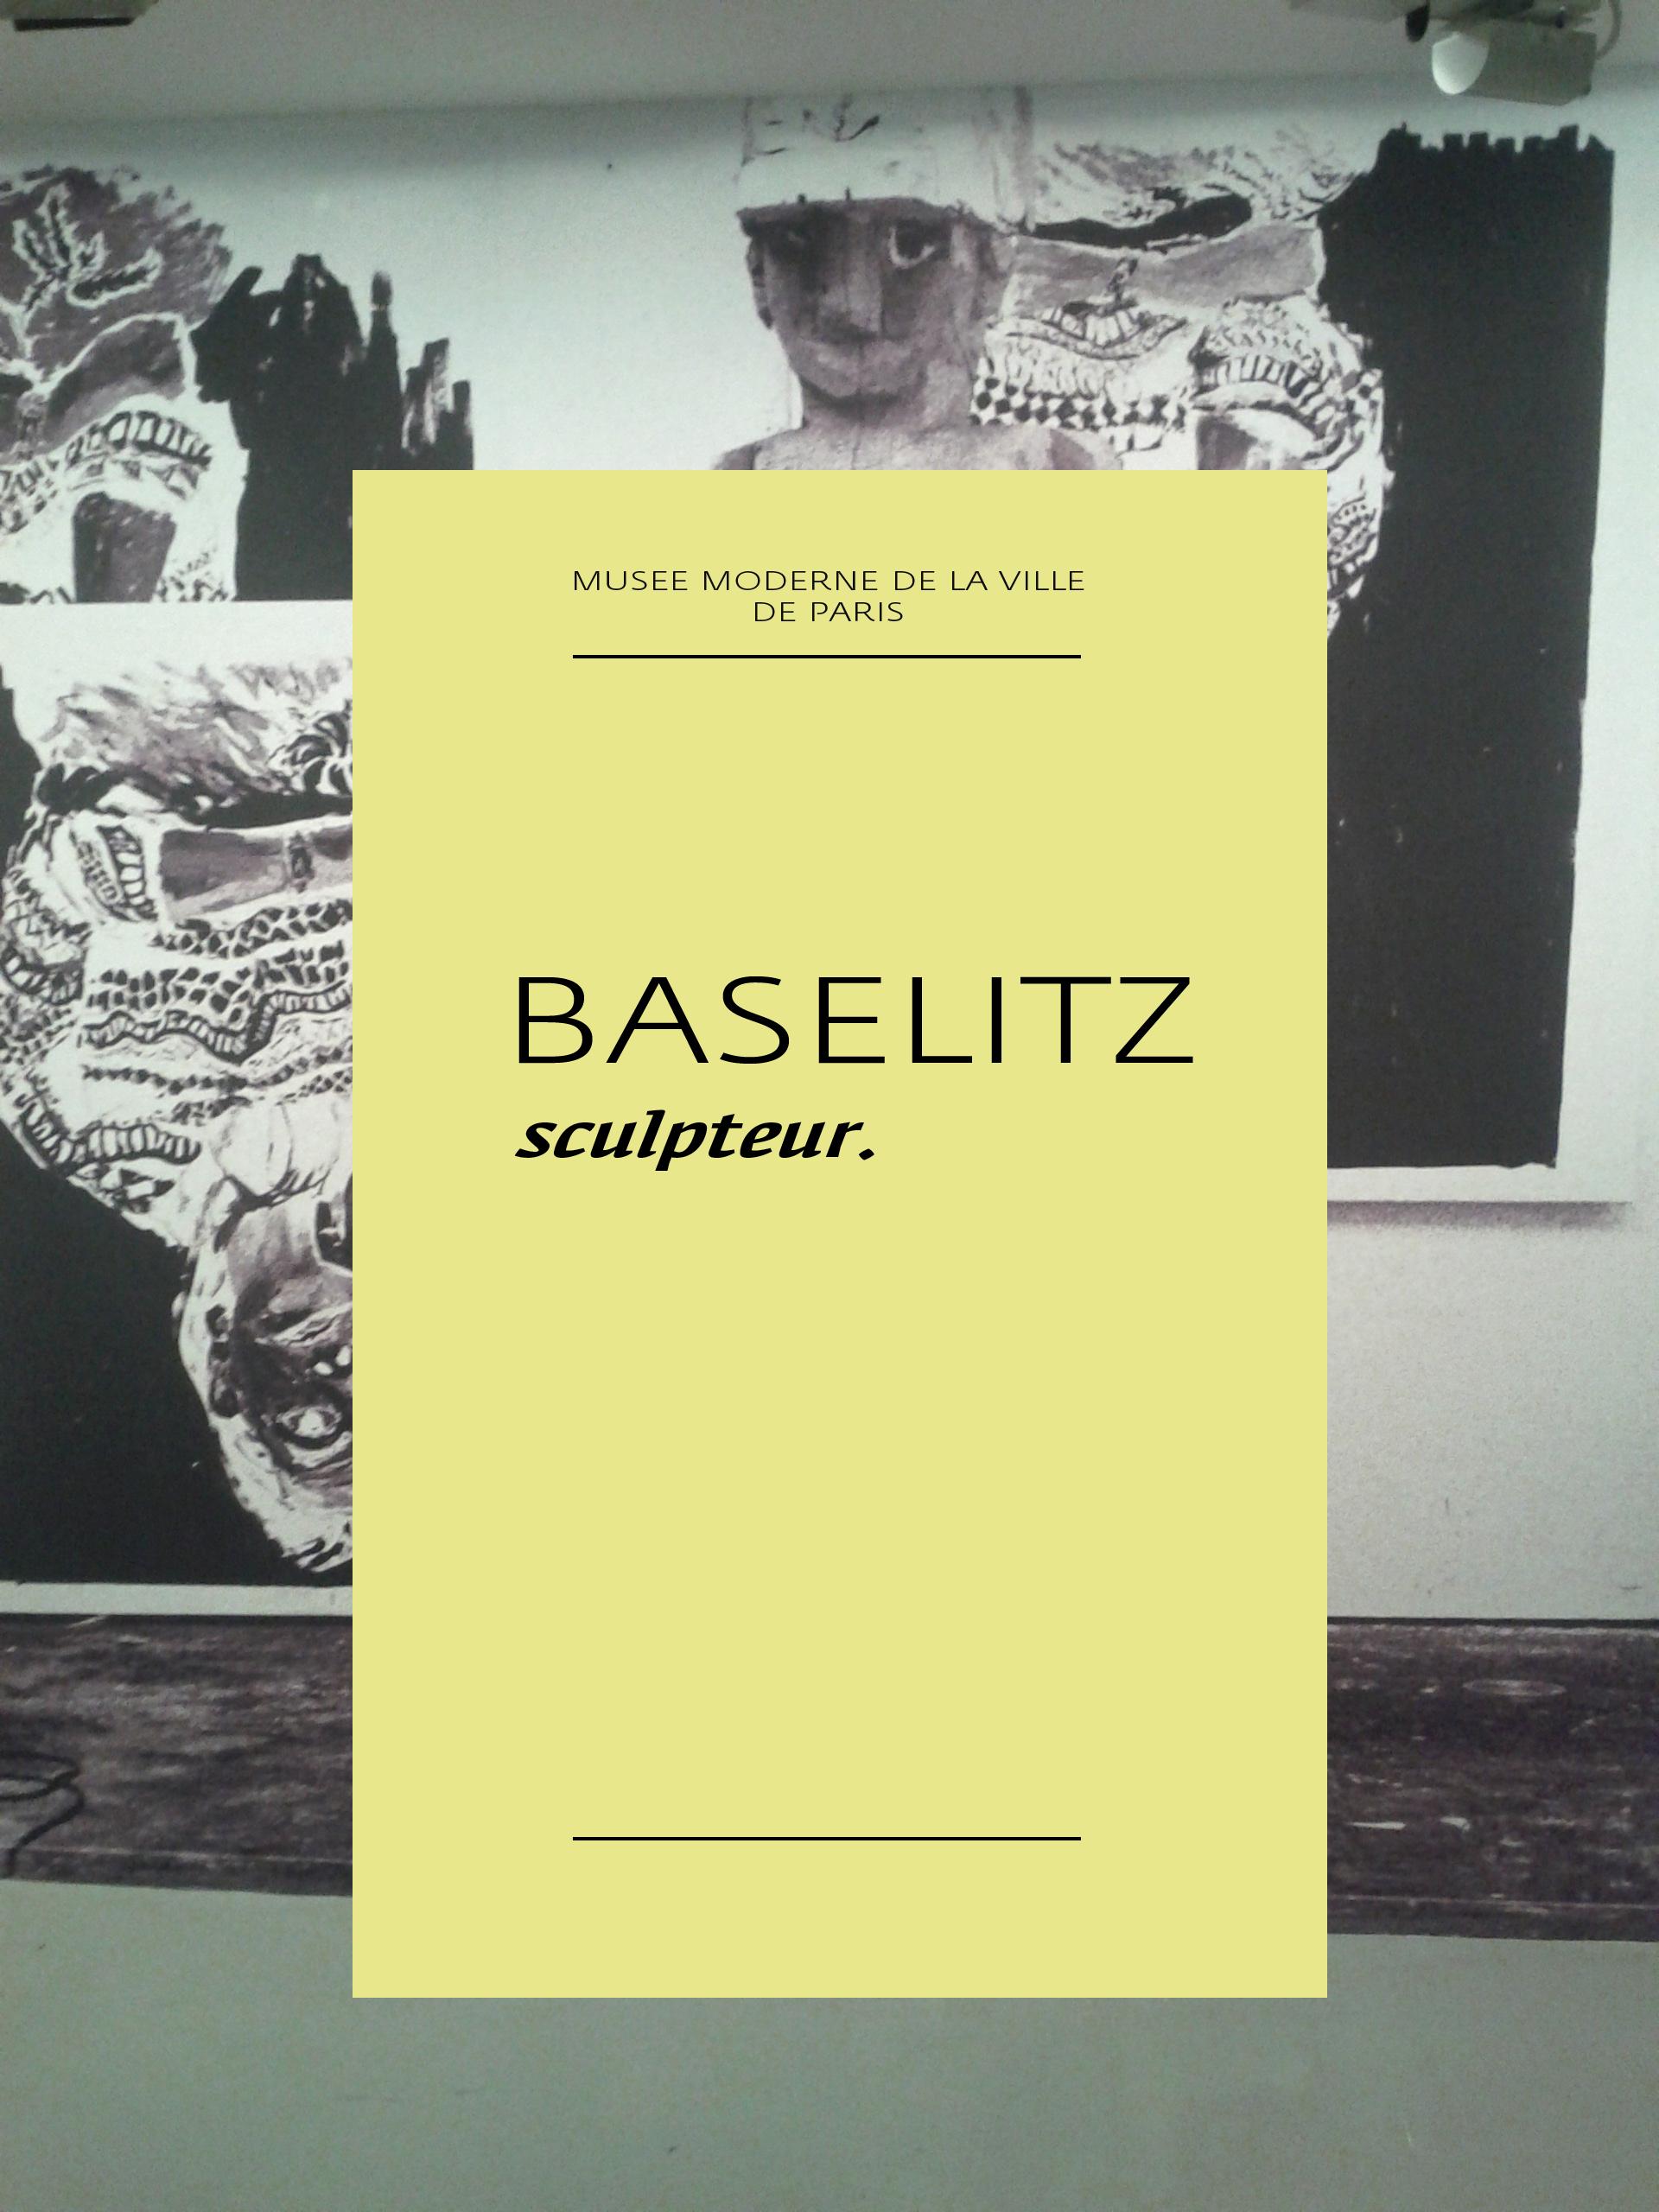 baselitz_1